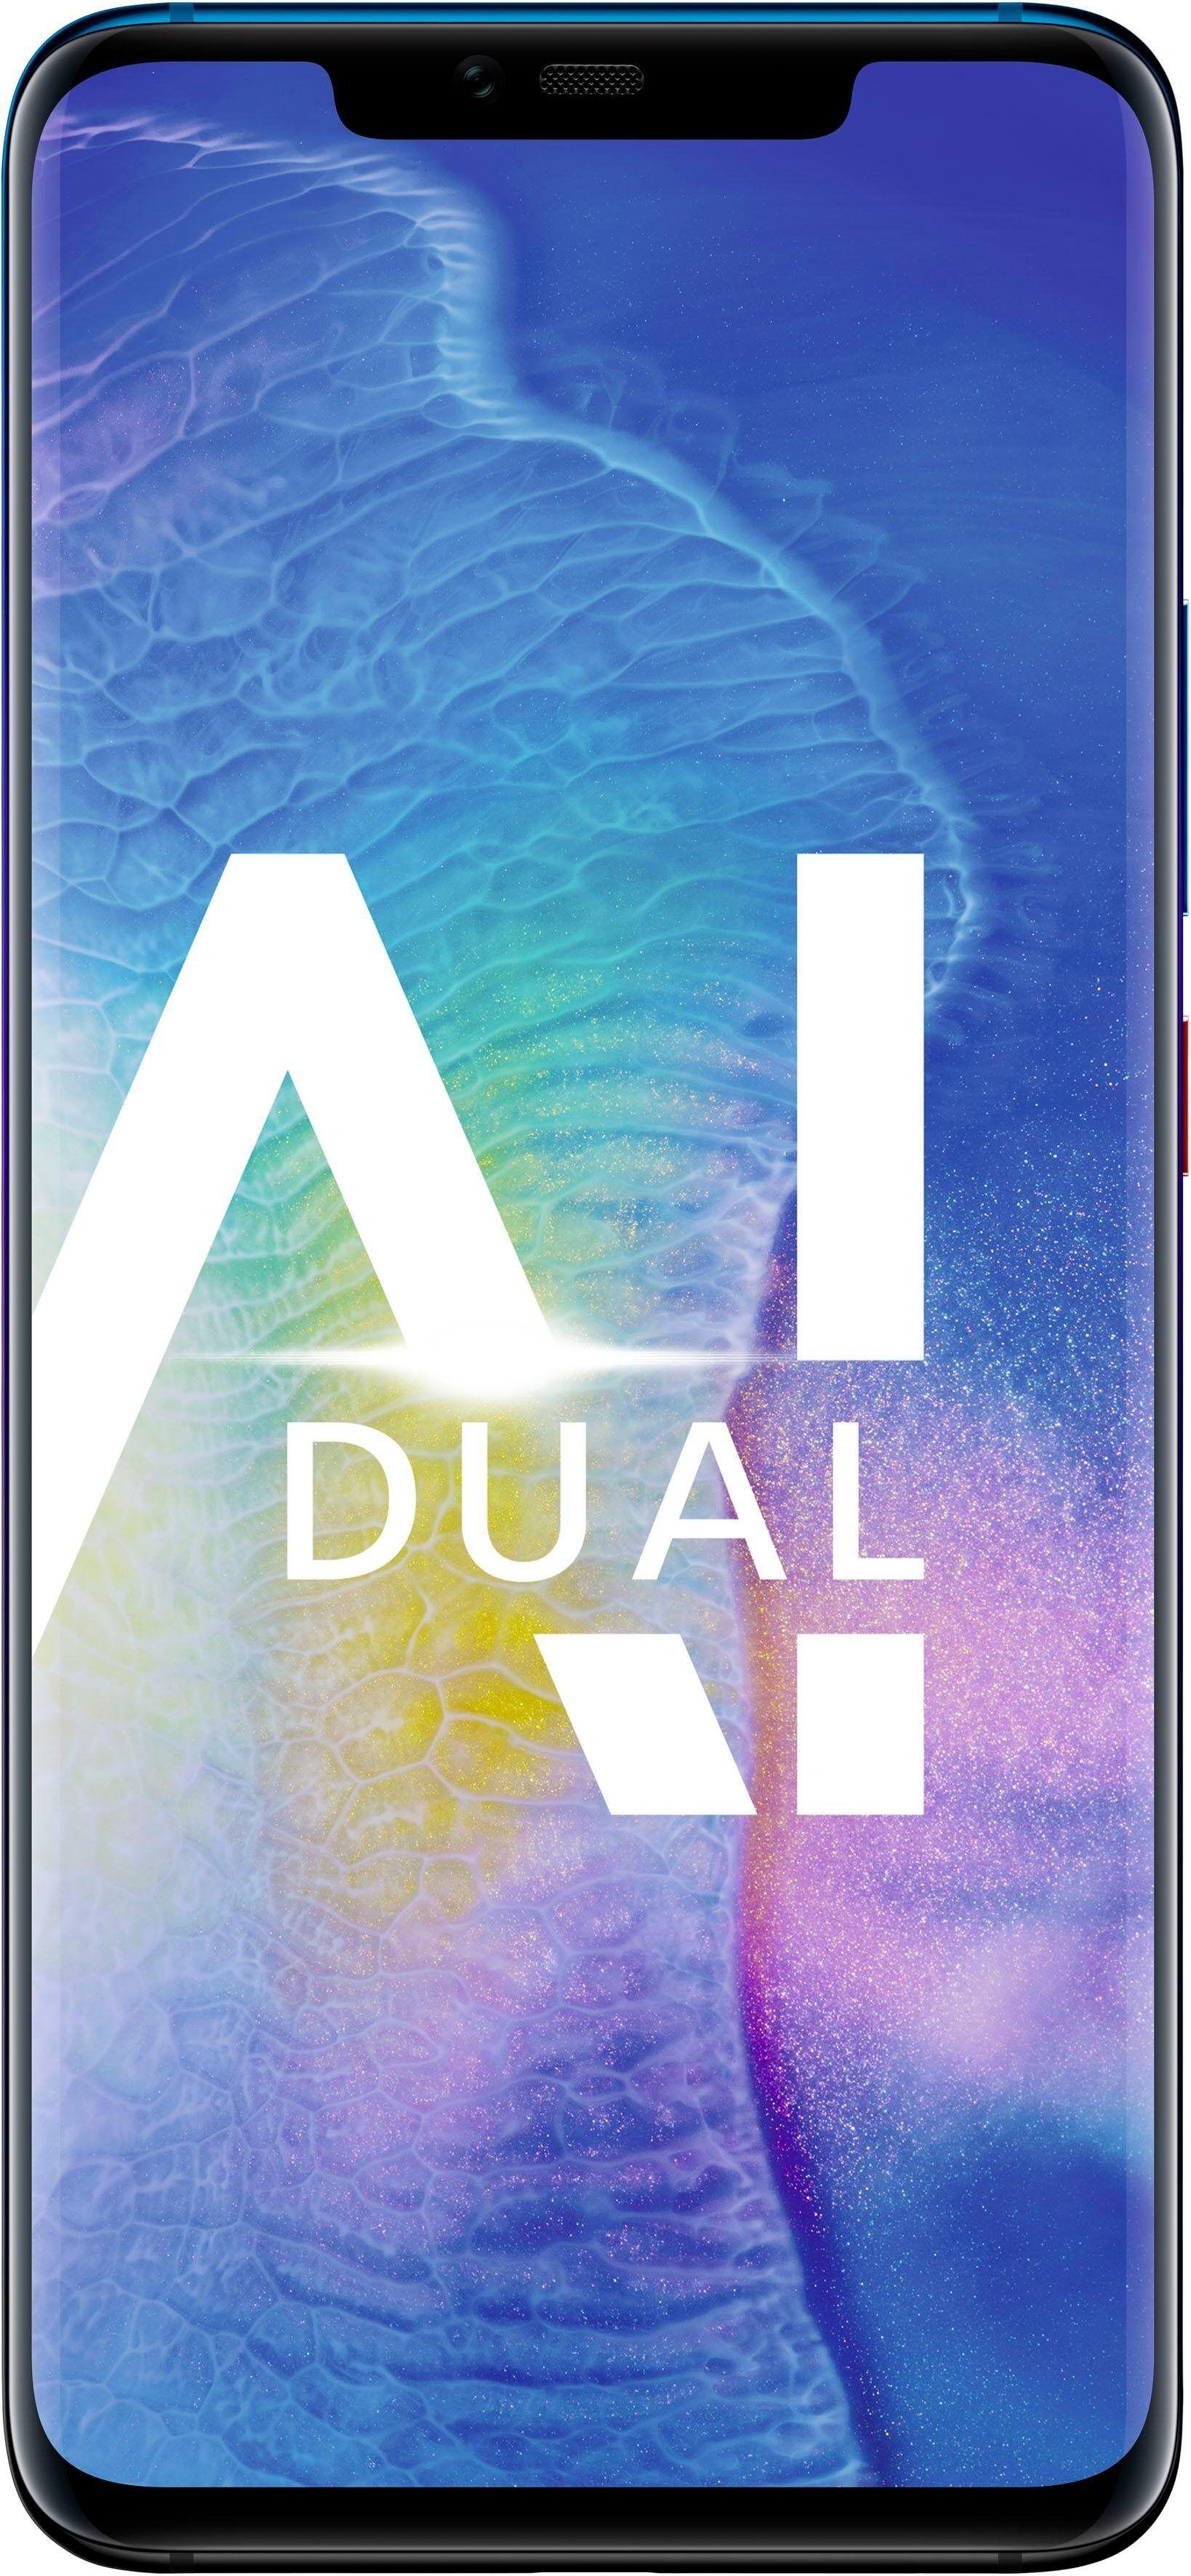 Huawei Mate20 Pro Smartphone (16,23 cm/6,3 Zoll, 128 GB Speicherplatz, 40 MP Kamera), Twilight